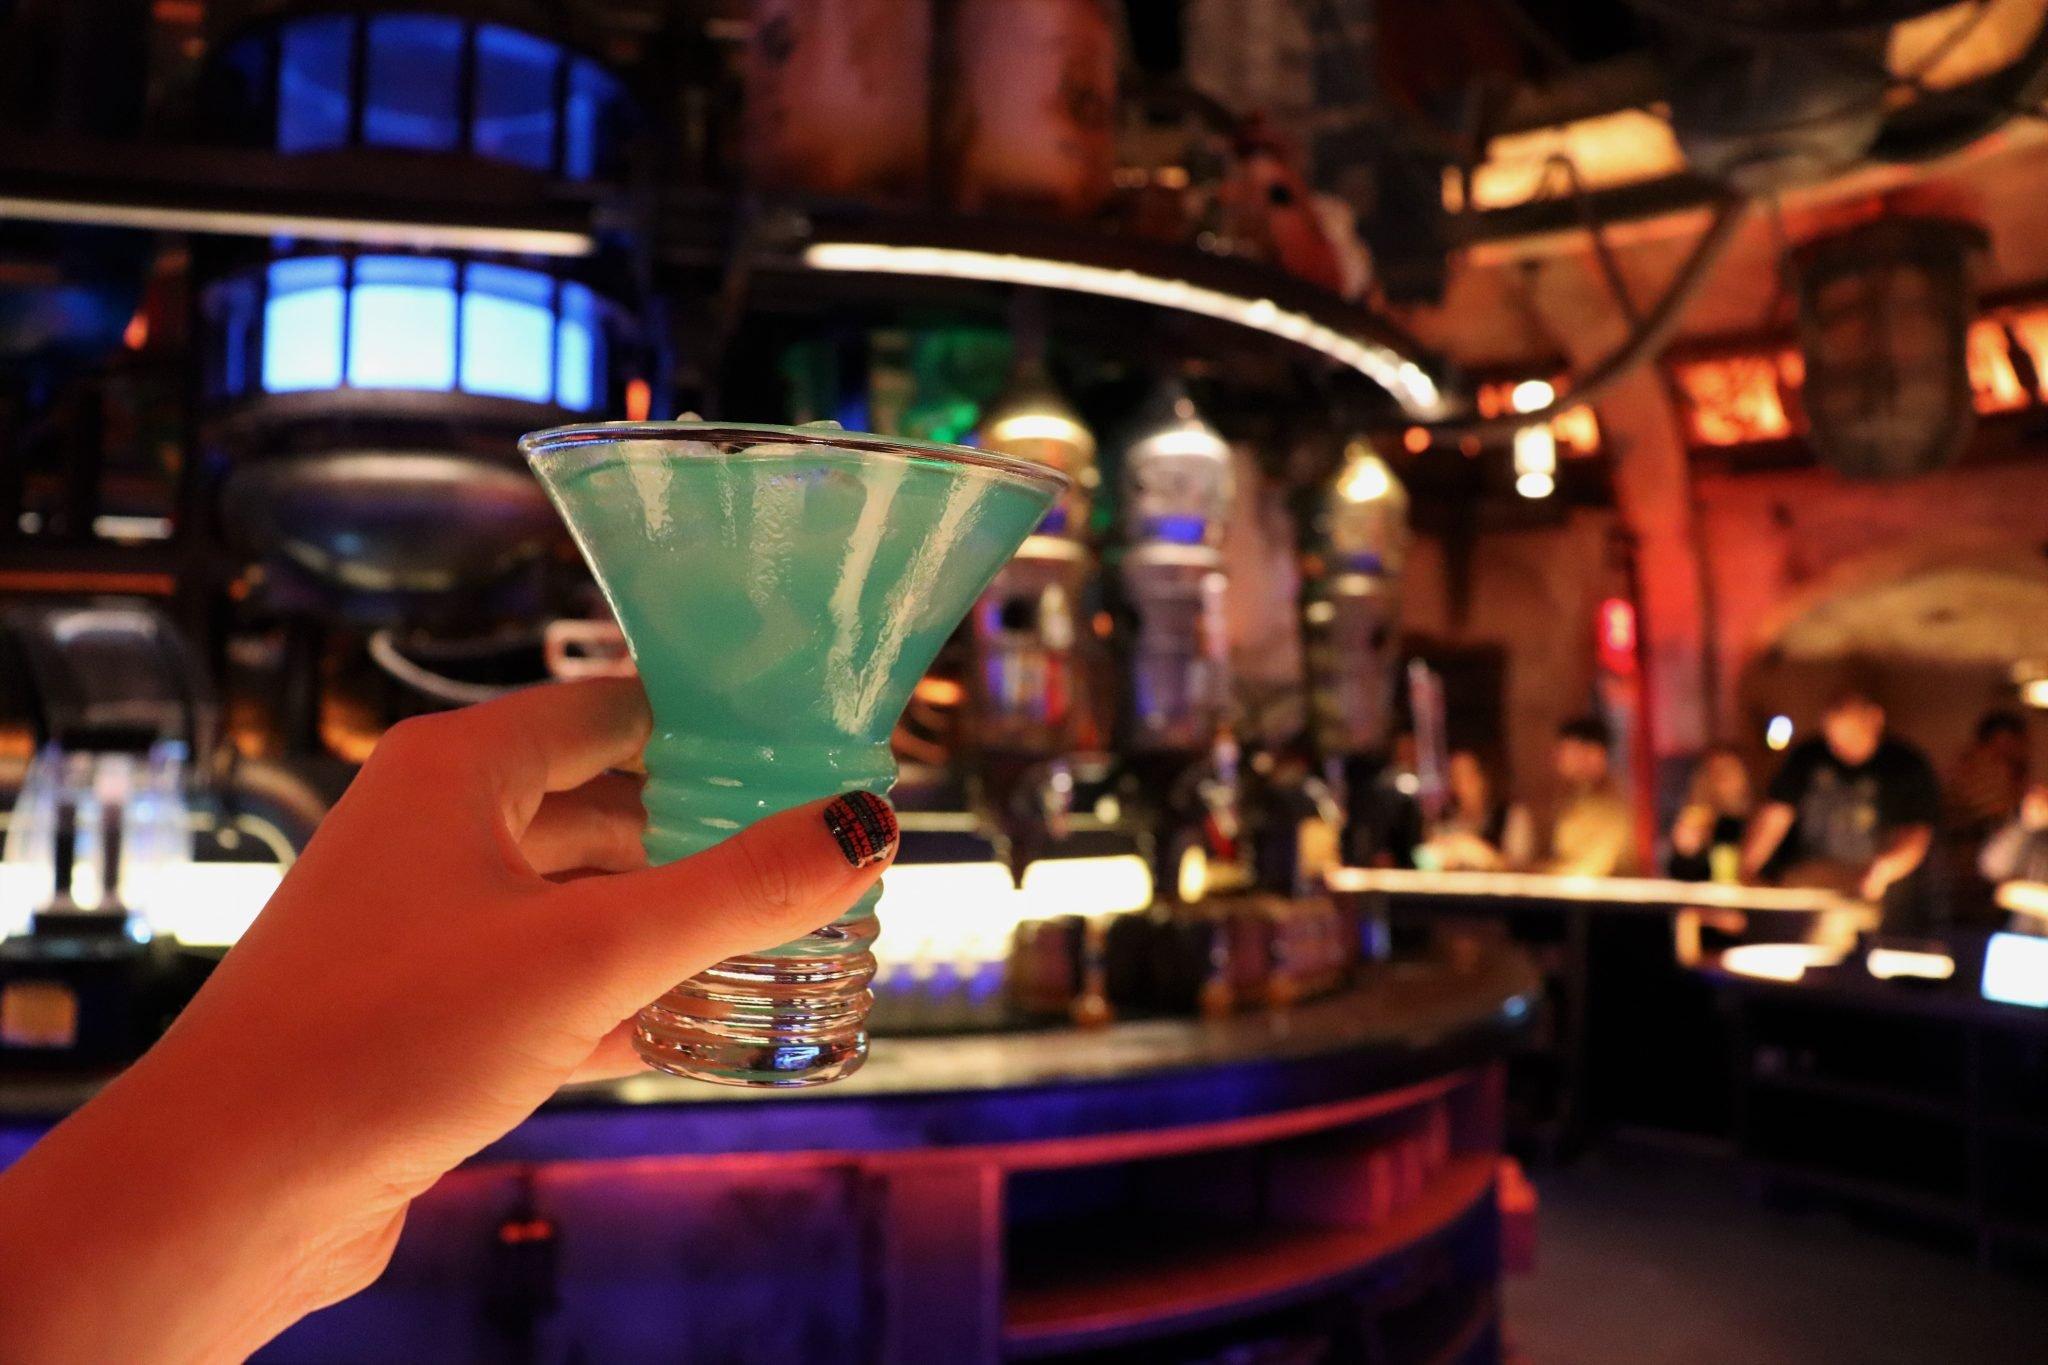 drinks at Oga's Cantina - Jedi mind trick